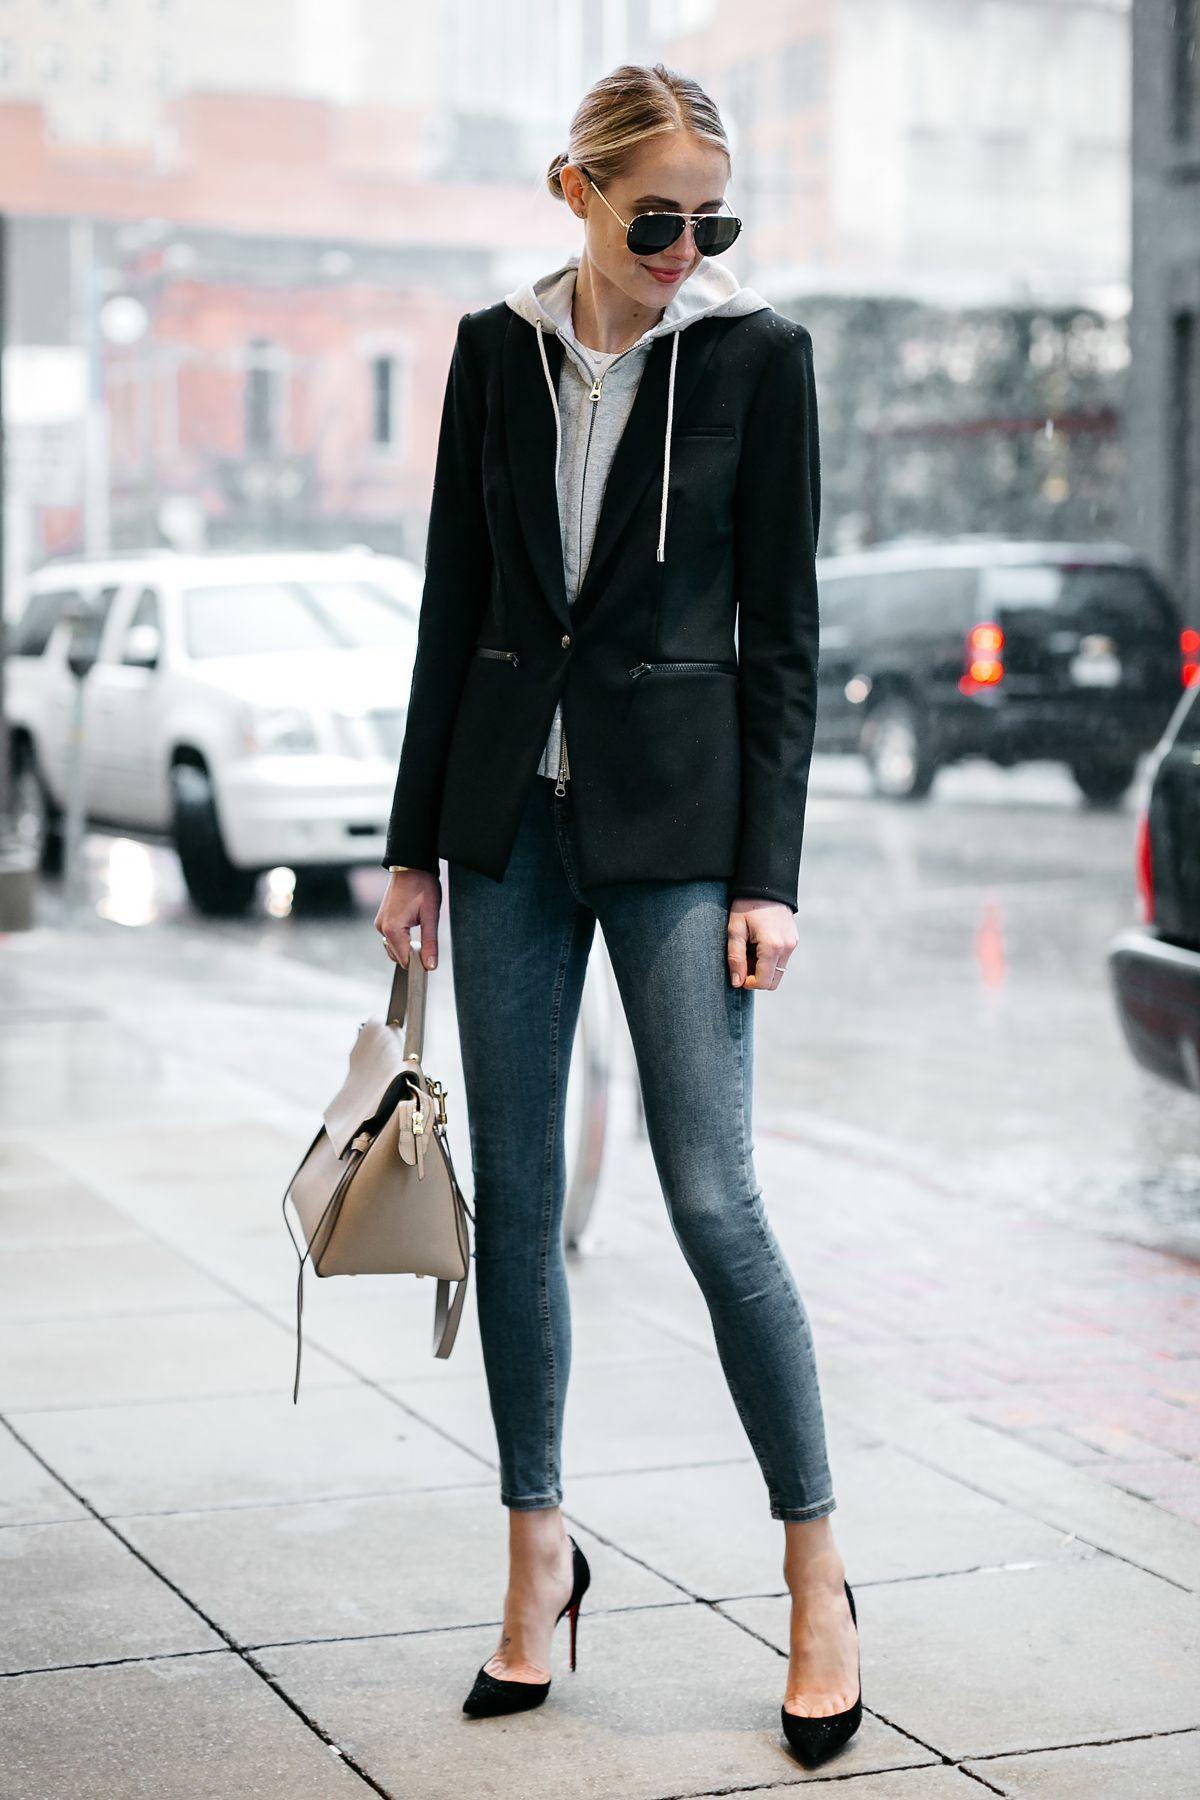 35f54dc3131 Veronica Beard Scuba Jacket Topshop Skinny Jeans Black Christian Louboutin  Pumps Celine Mini Belt Bag Fashion Jackson Dallas Blogger Fashion Blogger  Street ...